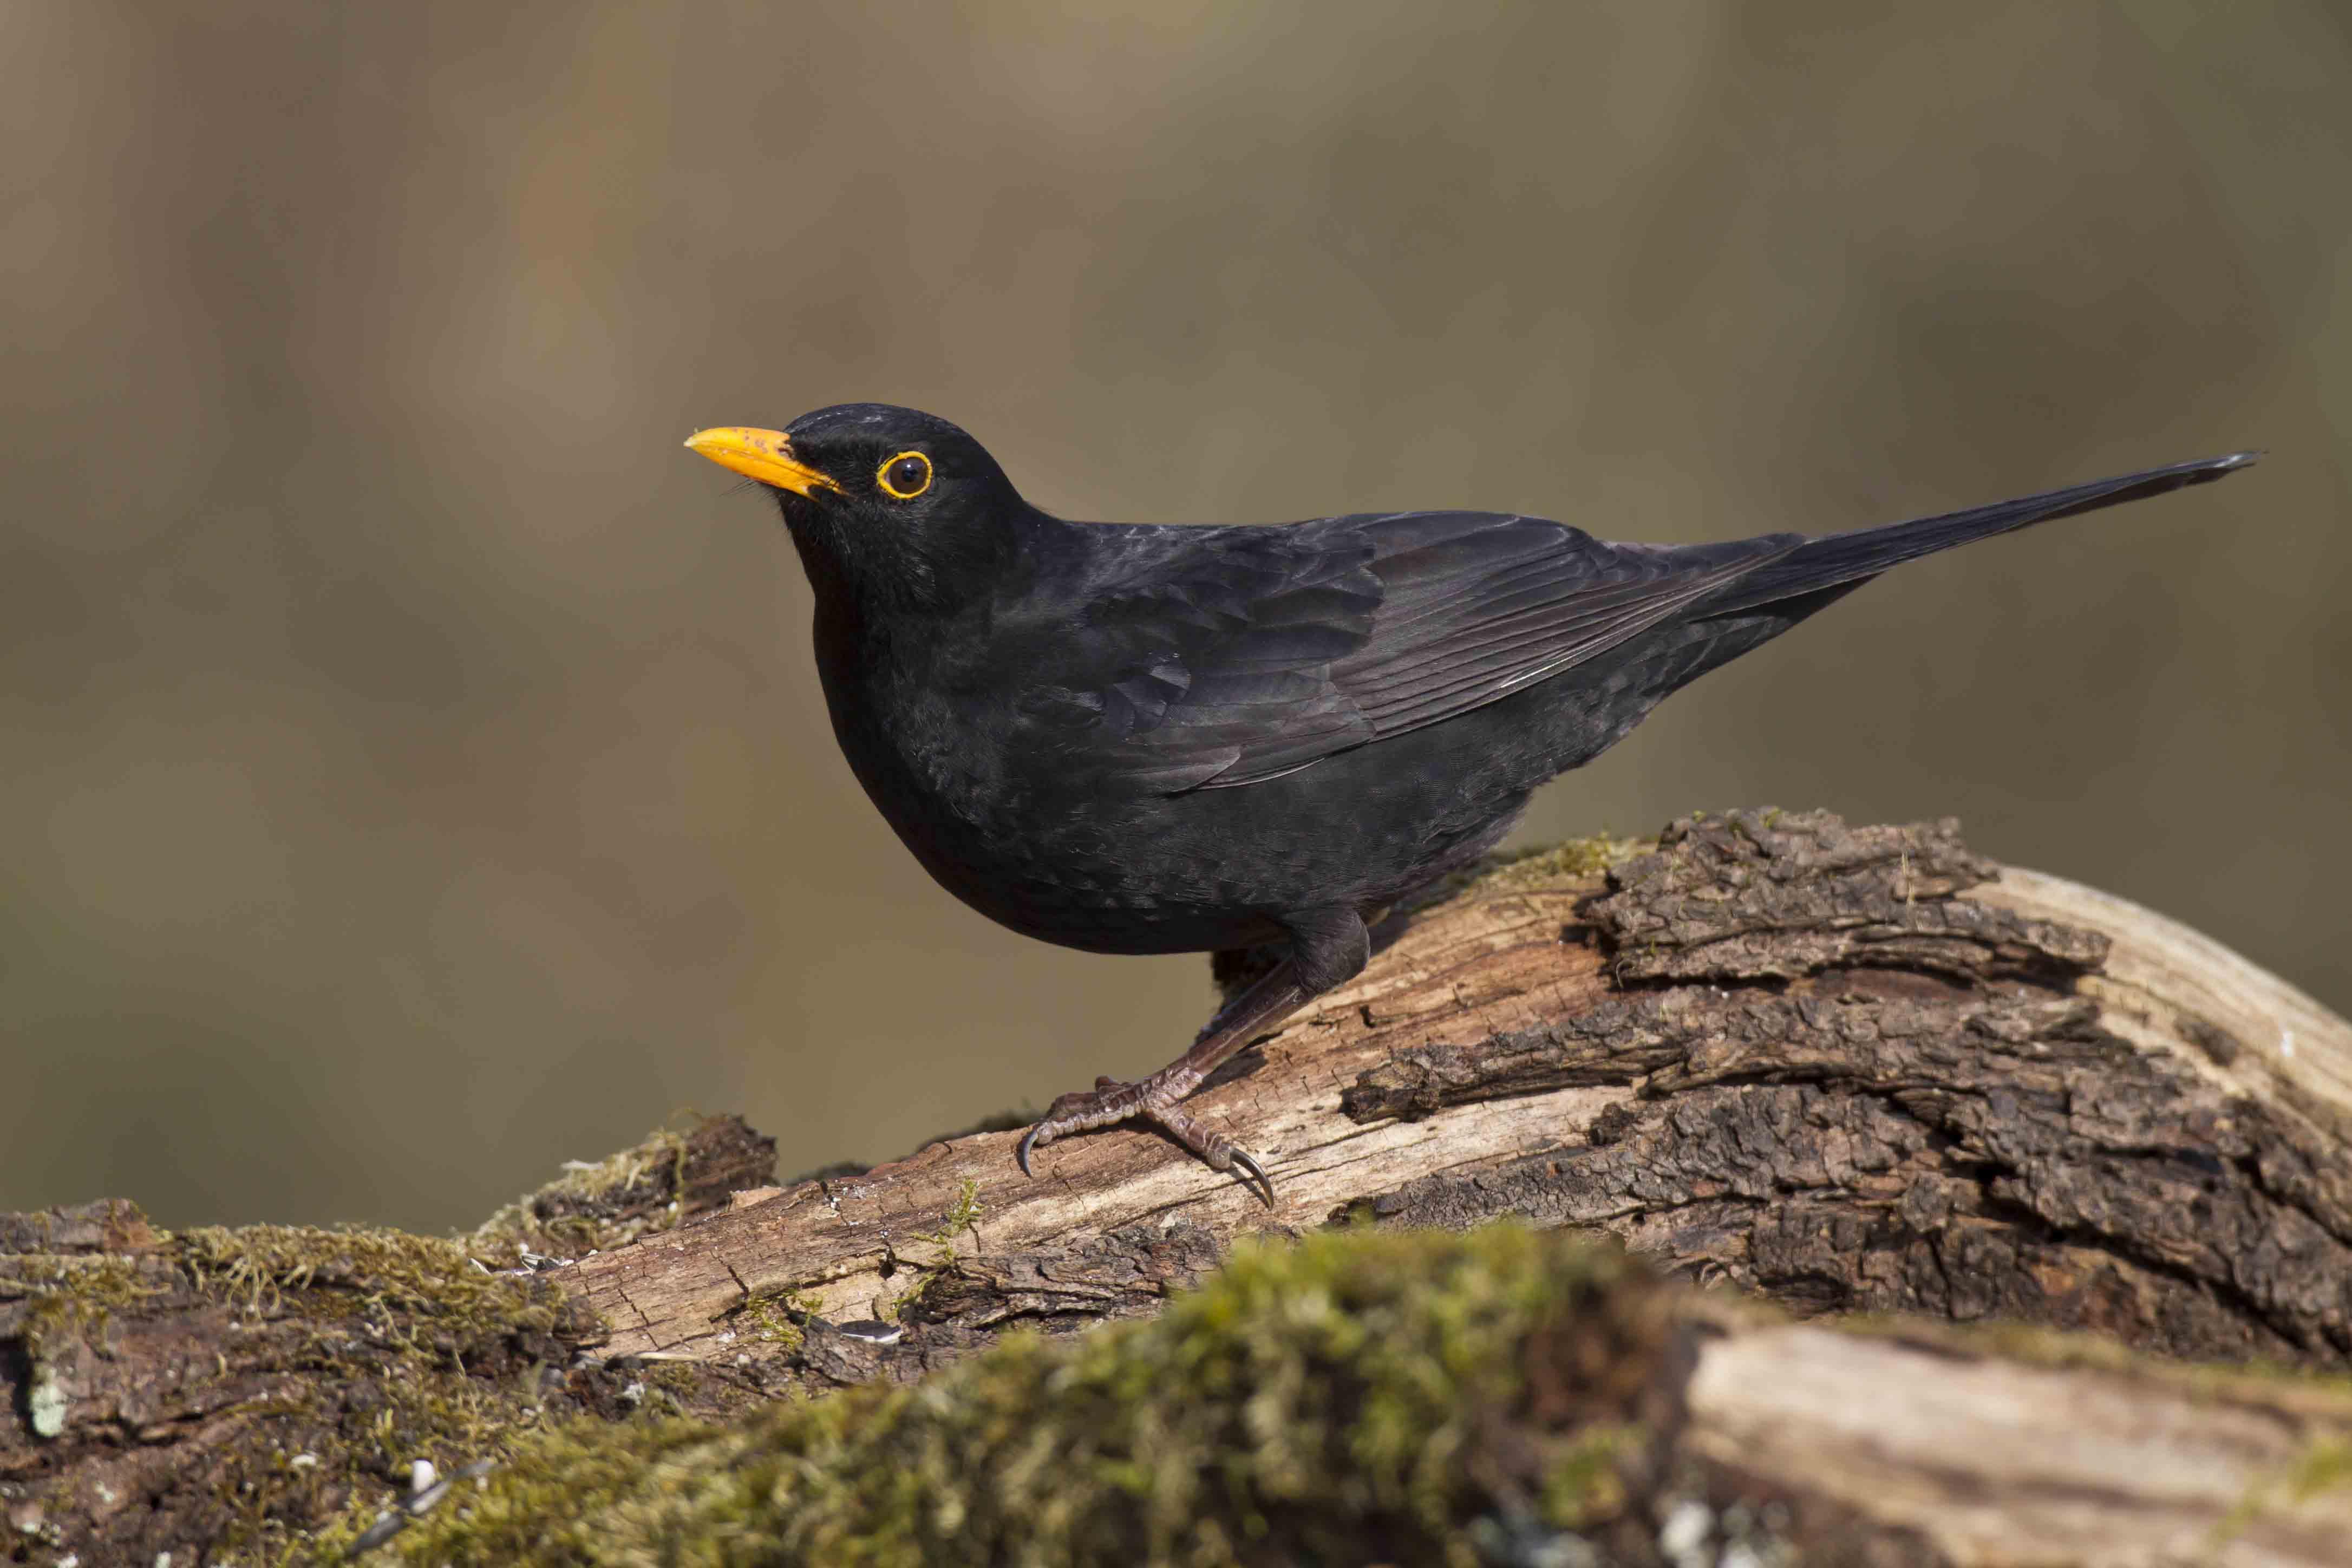 BLACKBIRD,CHRISTIAN SYMBOLISM